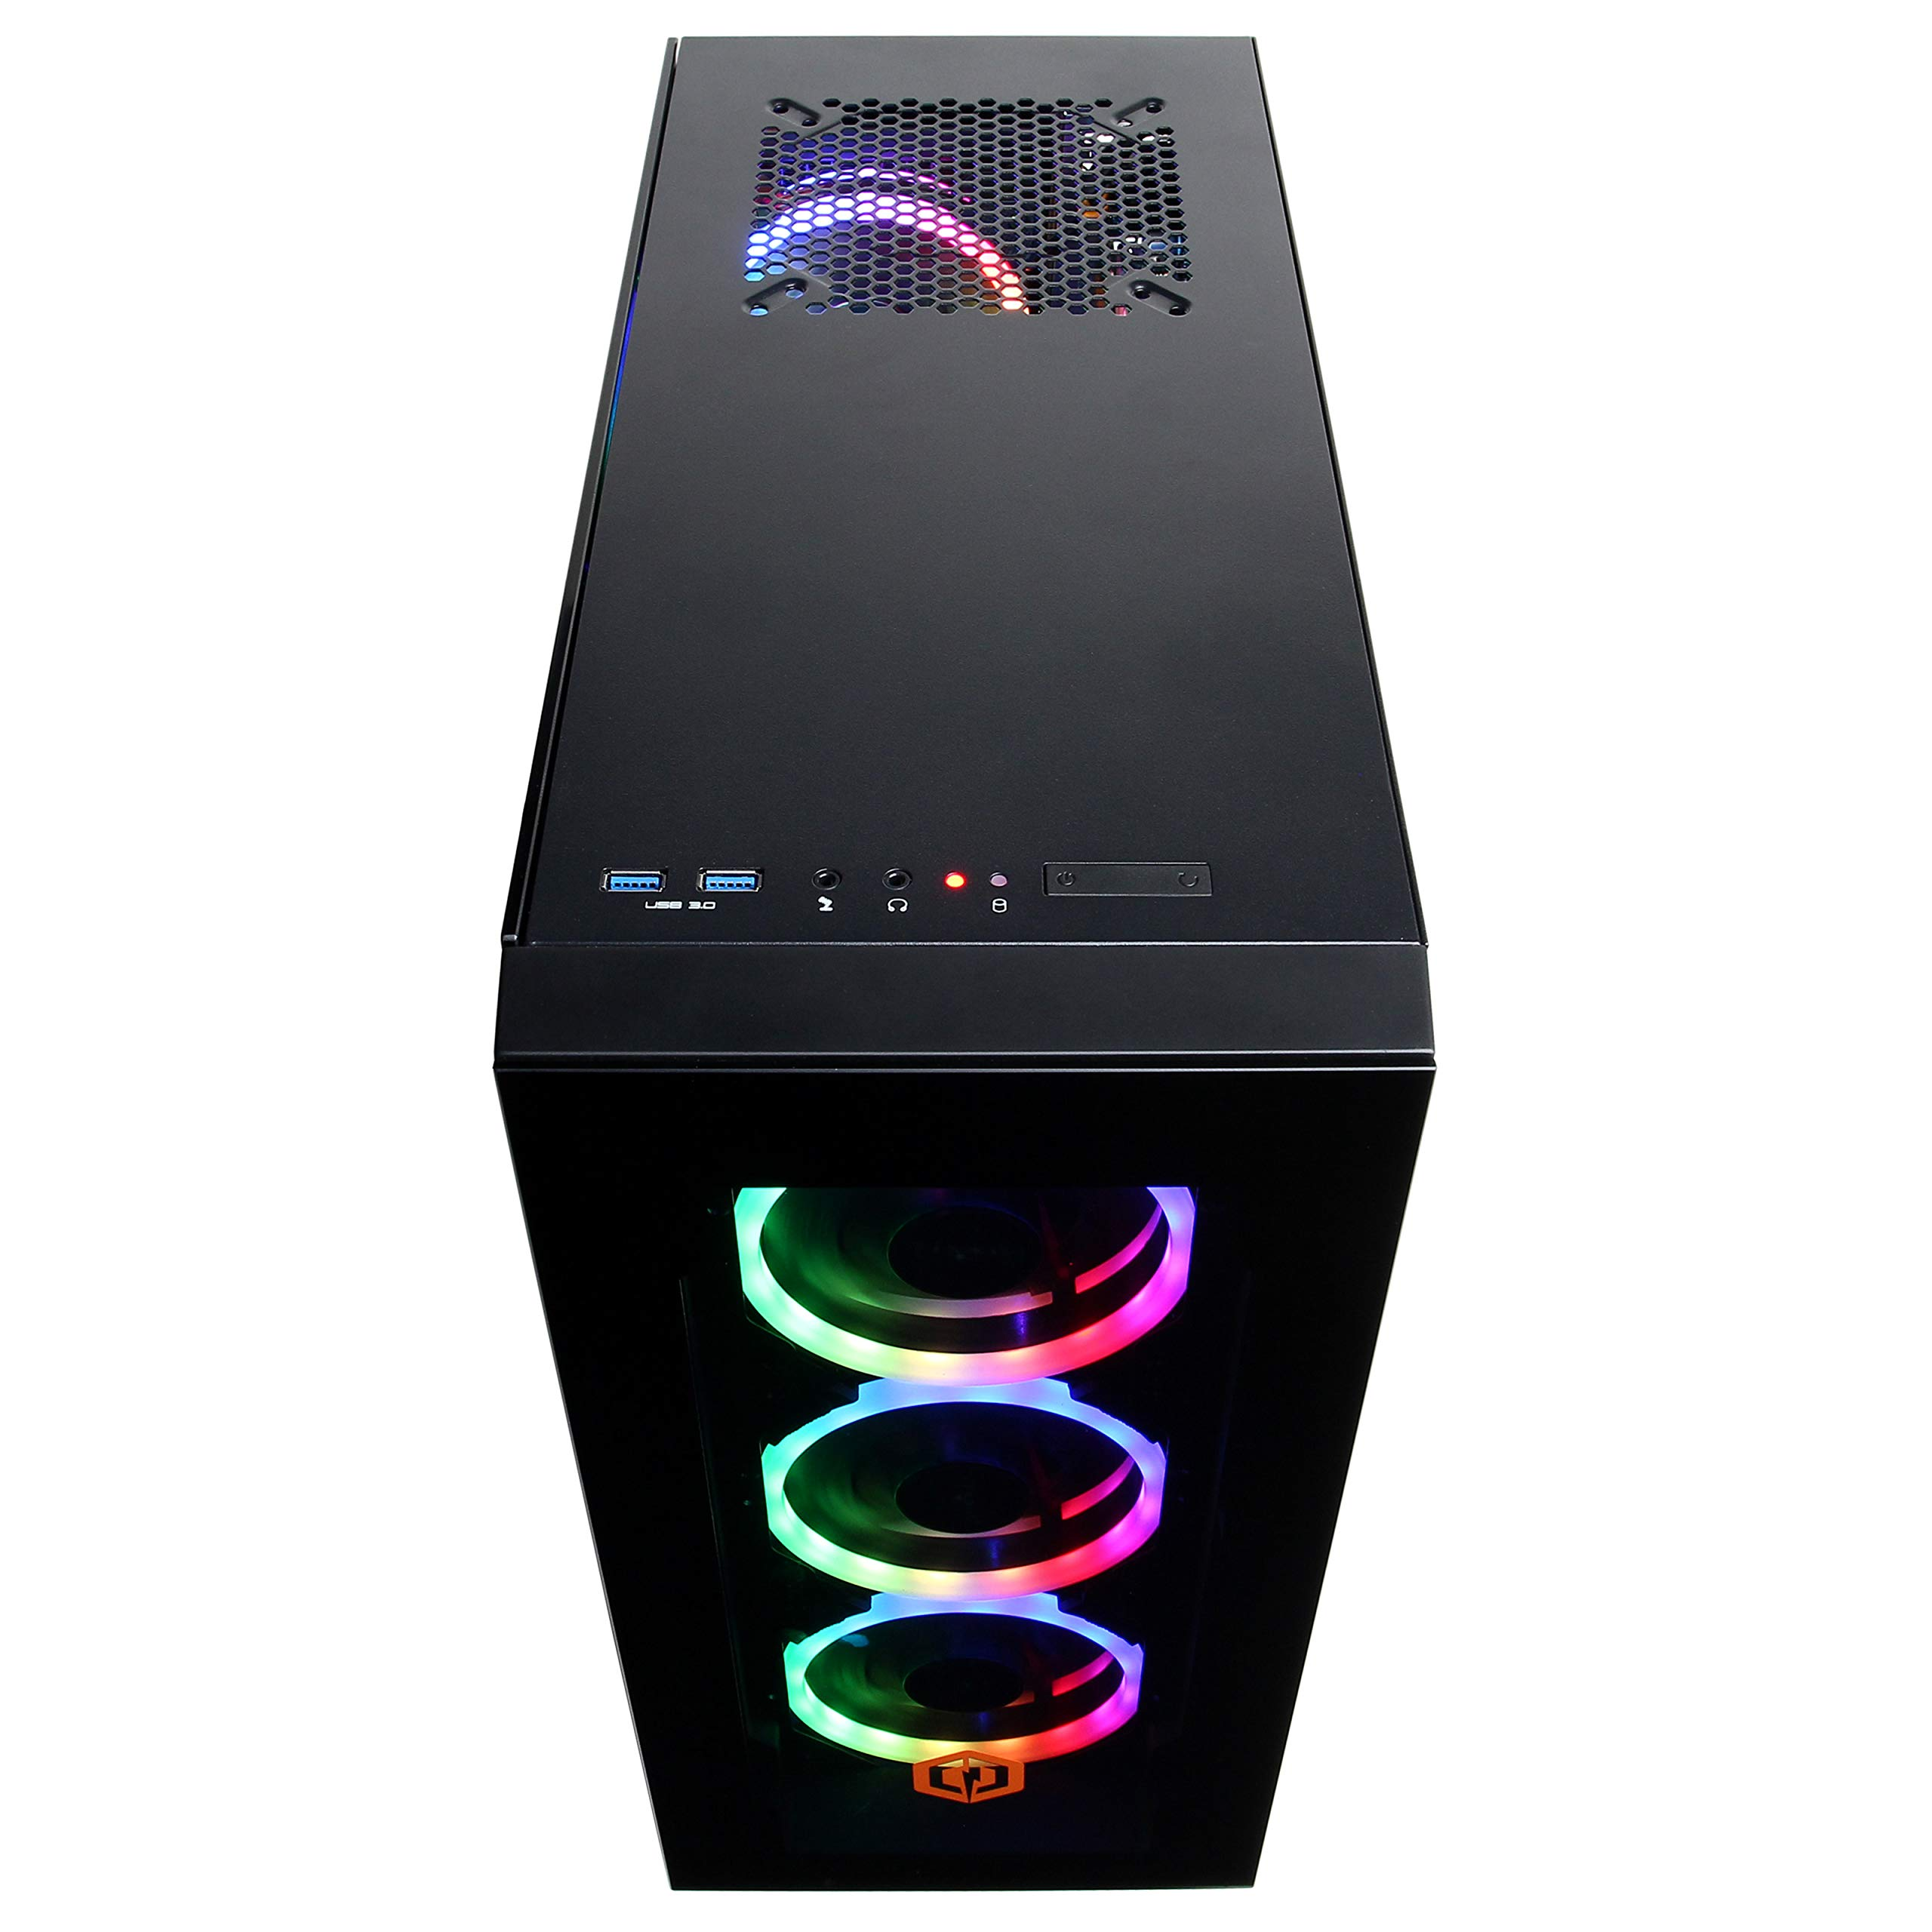 CYBERPOWERPC Gamer Xtreme VR Gaming PC, Intel Core i7 11700KF 3.6GHz, GeForce RTX 3060 12GB, 16GB DDR4, 500GB NVMe SSD, 2TB HDD, WiFi Ready & Windows 10 Home (GXiVR8400A7, Black)